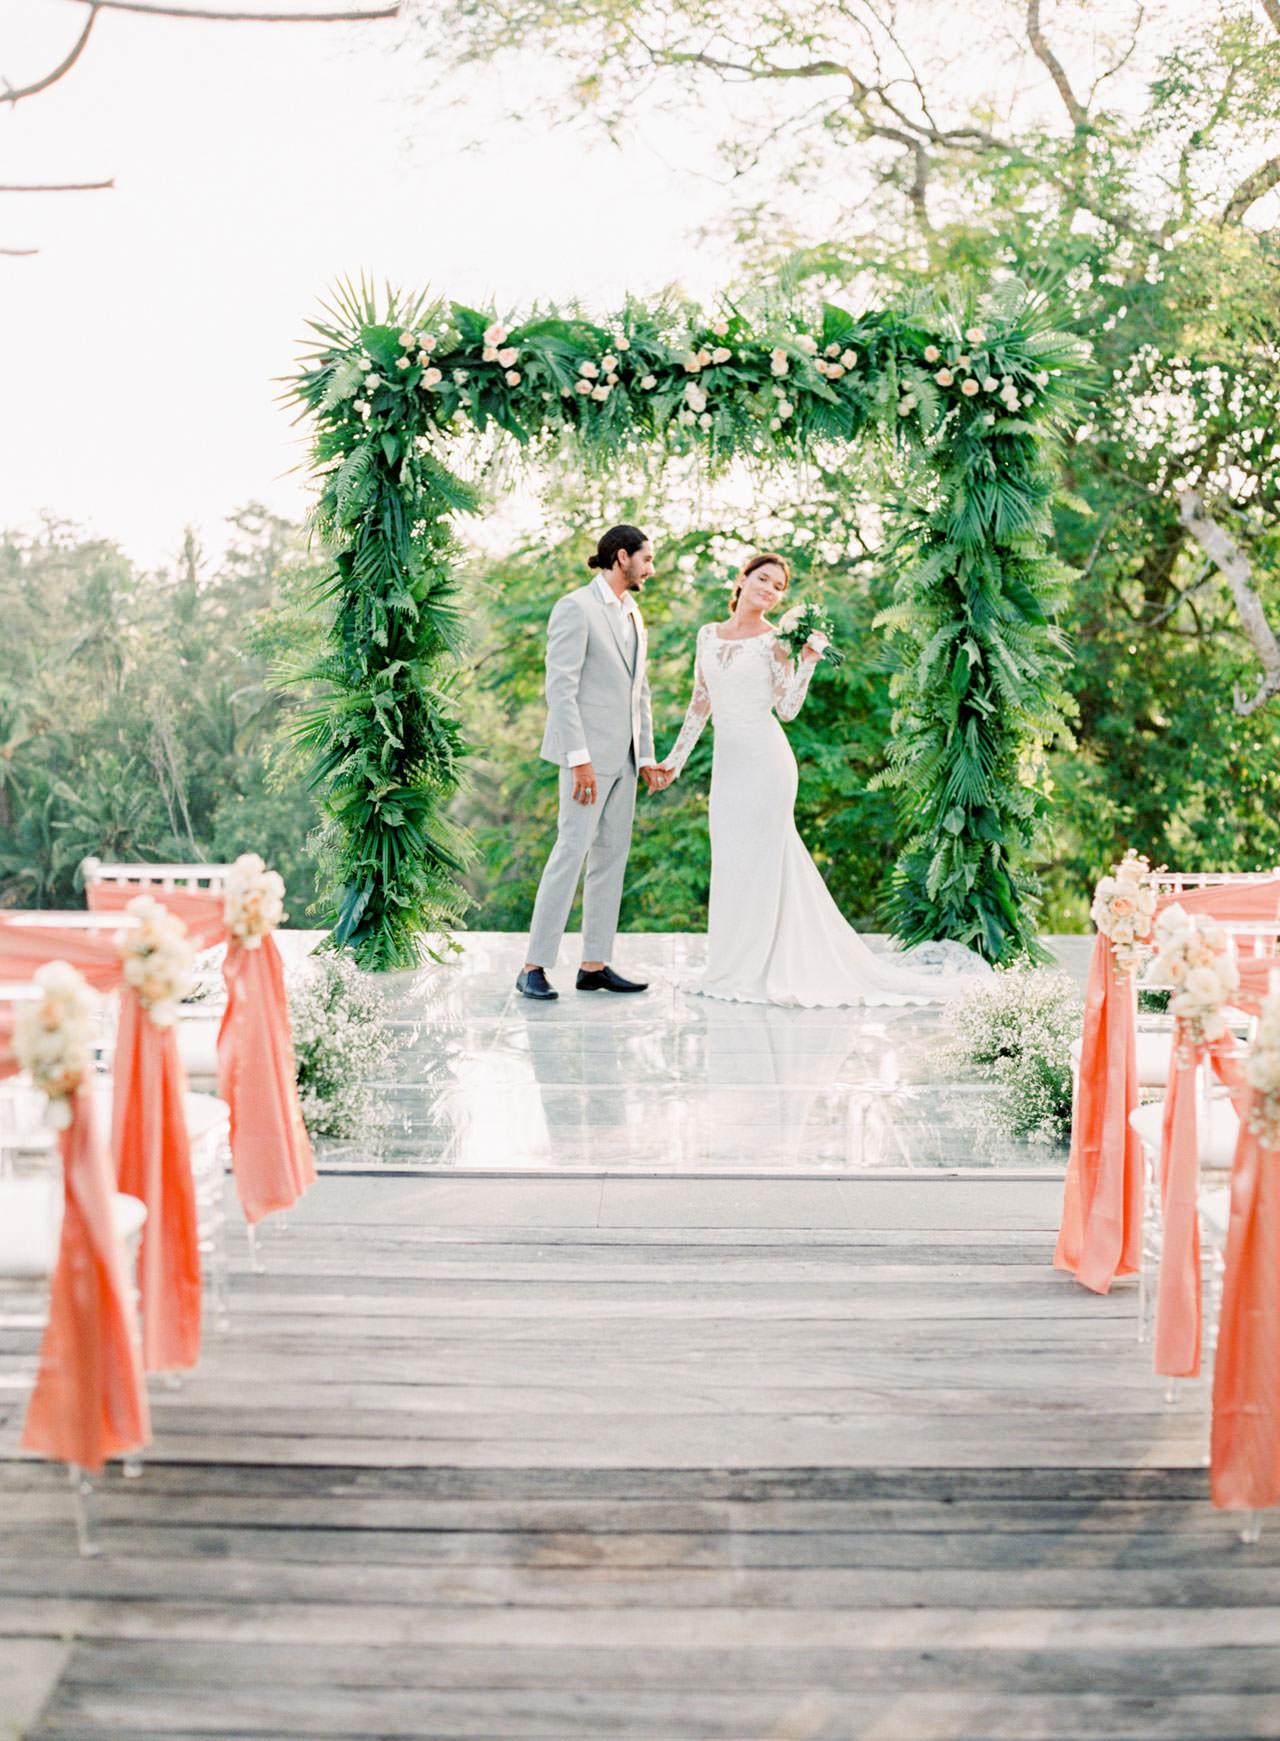 Ubud Wedding at Bisma Eight - Bali Editorial Style Photography 17